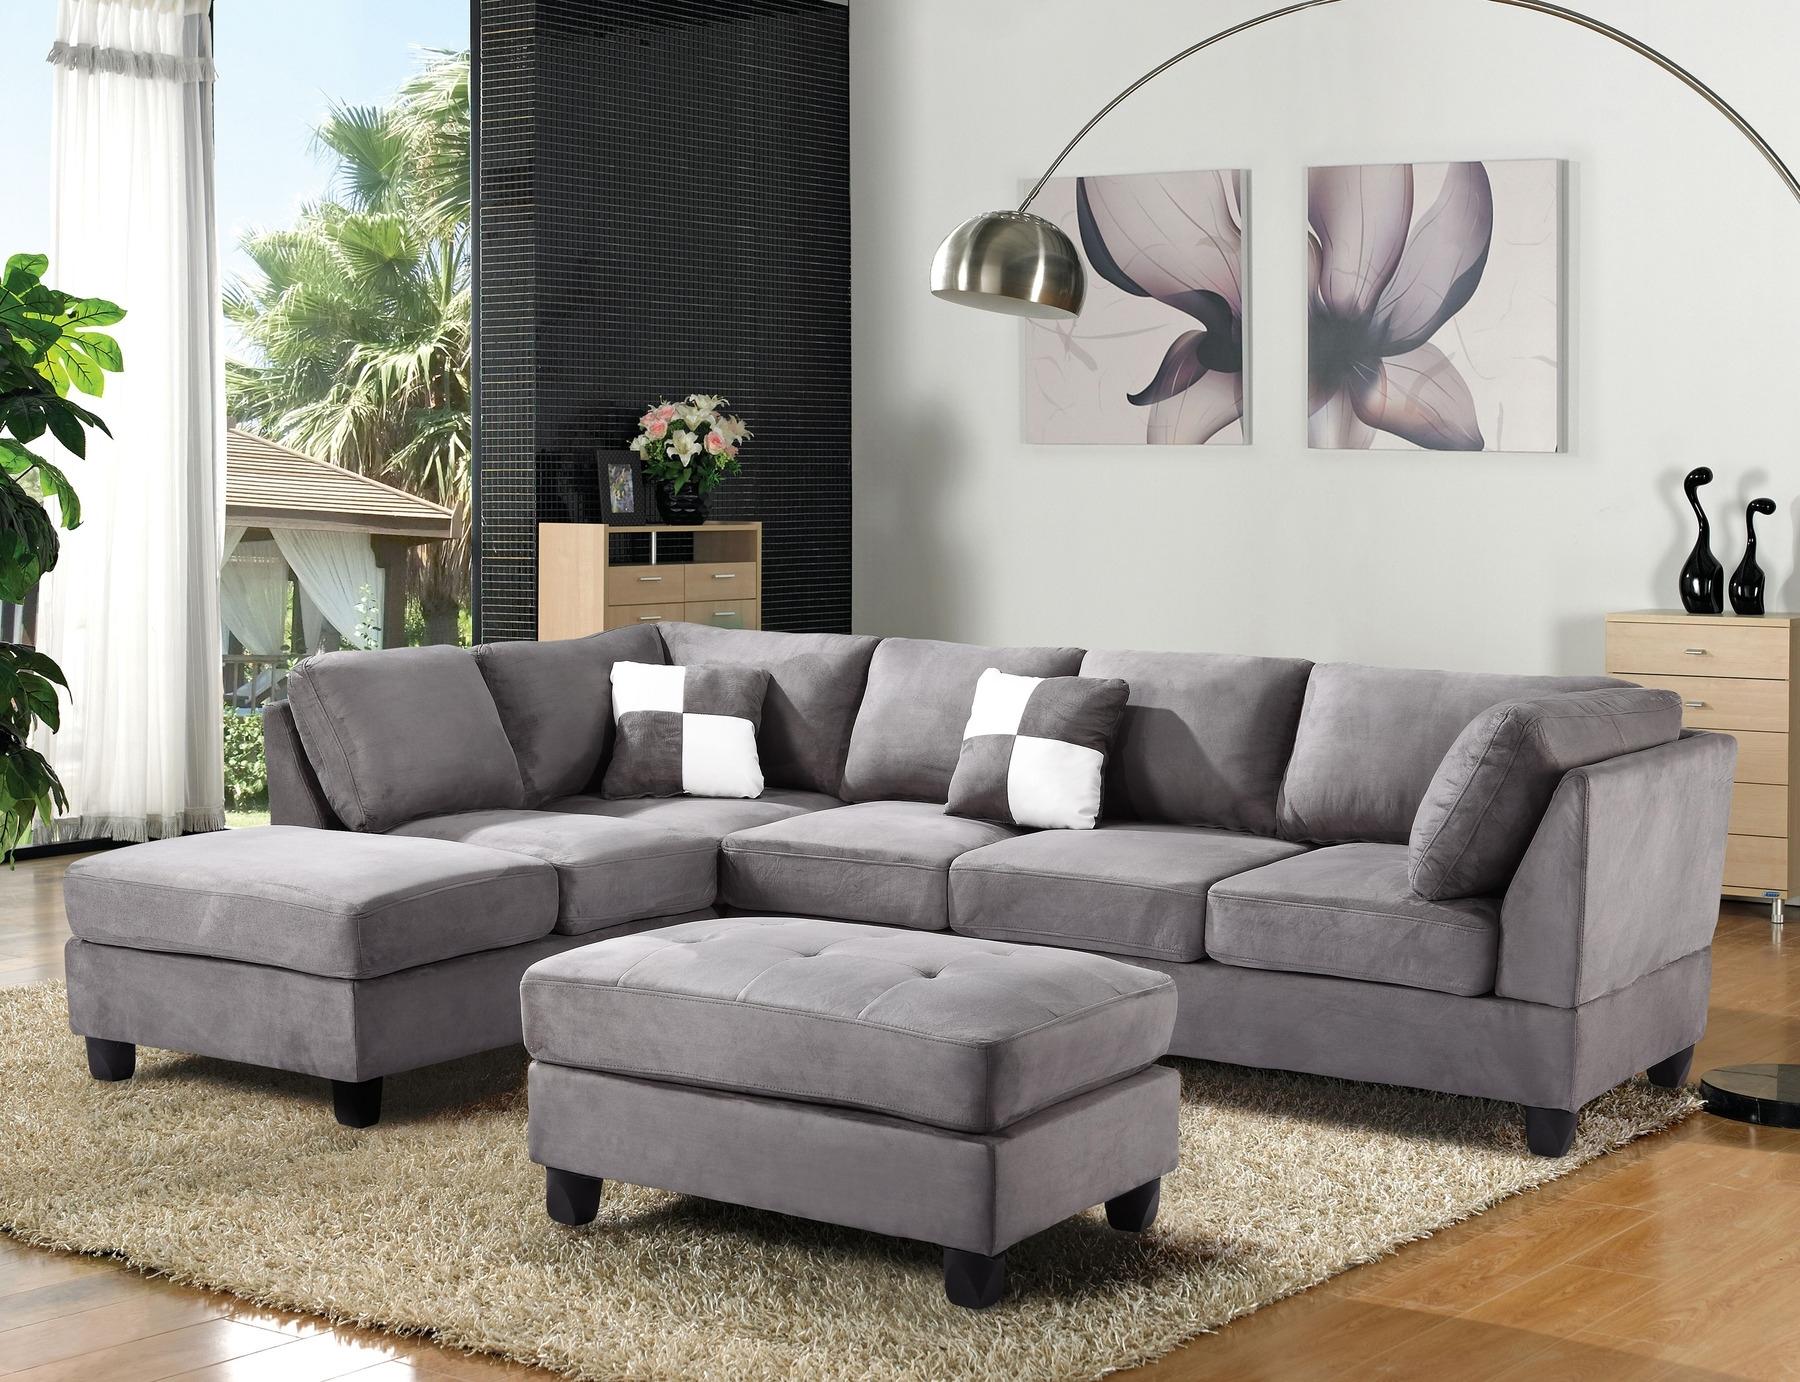 Sectional Sofas At Ashley Furniture For Fashionable Sofa : Signature Designashley Toletta Chocolate Sectional Sofa (View 12 of 15)